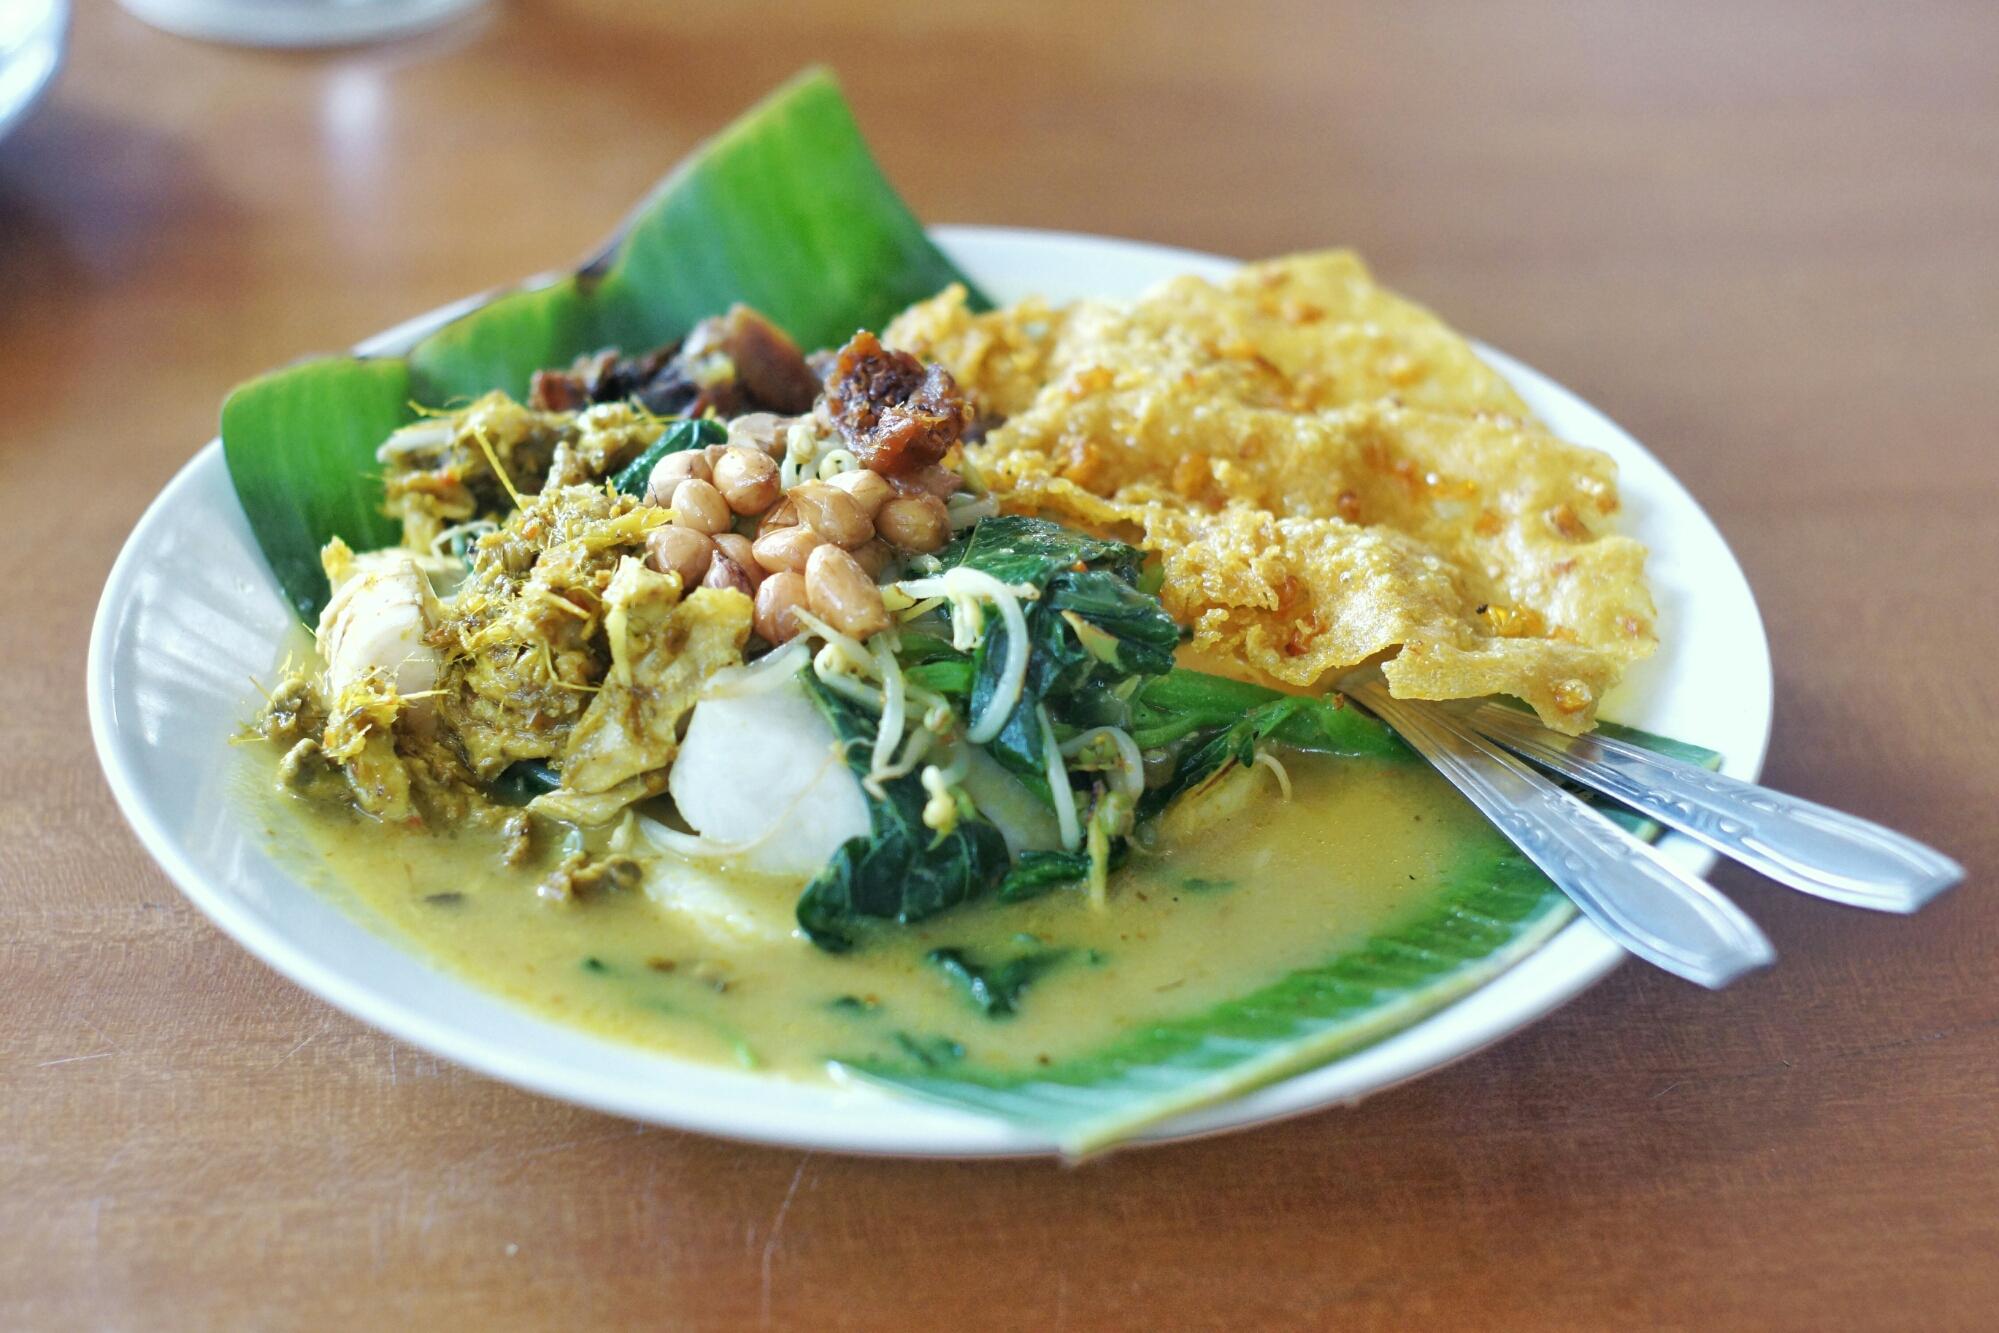 tipat-blayag-khas-bali subak cooking class.jpg